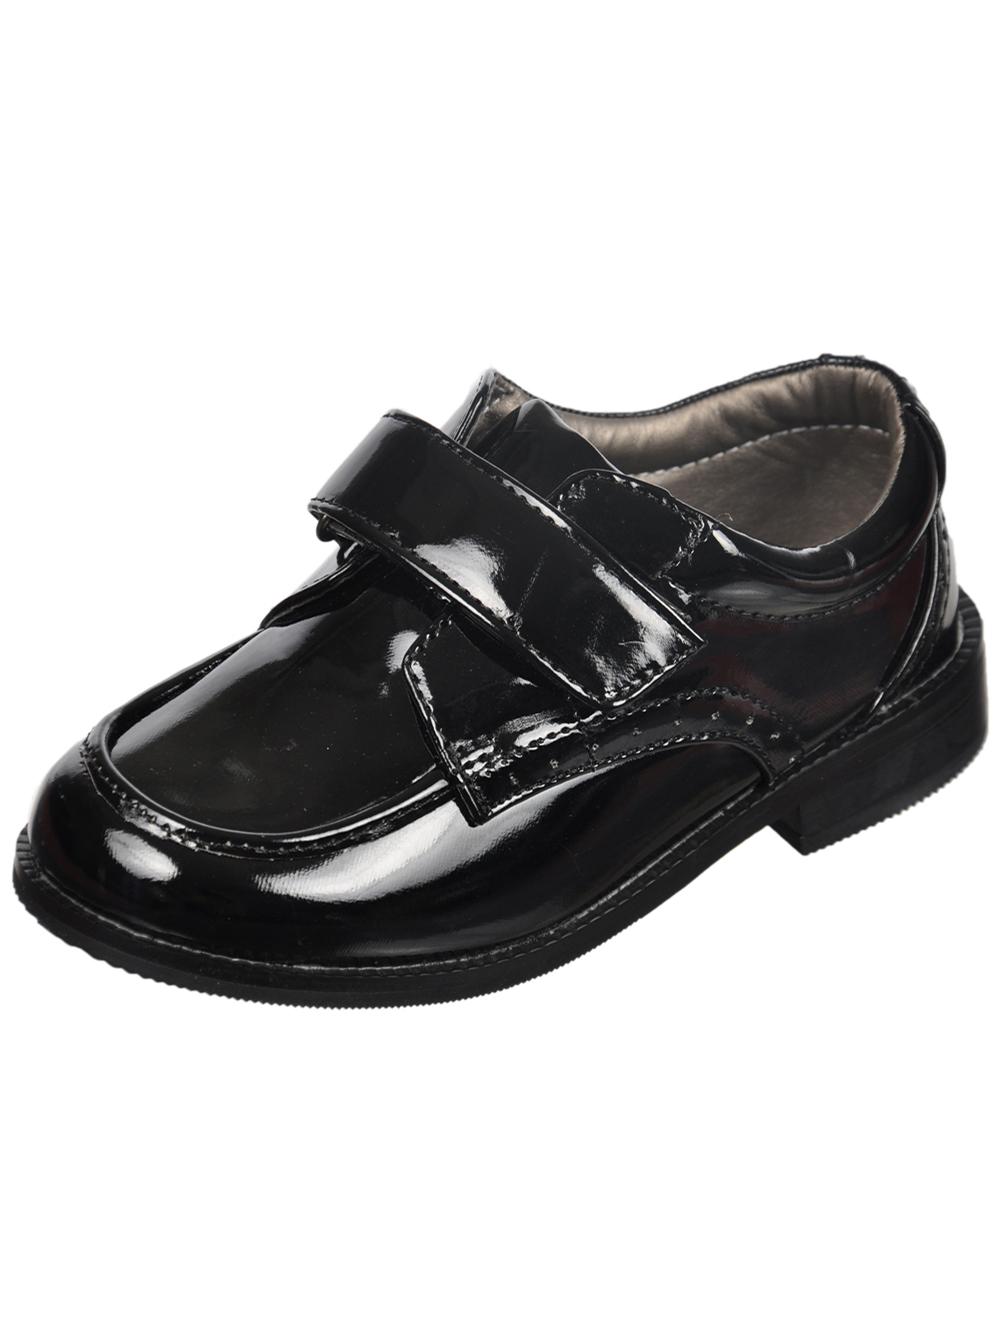 Image of Josmo Oreille Brogue Dress Shoes Toddler Boys Sizes 5  12  black 12 toddler